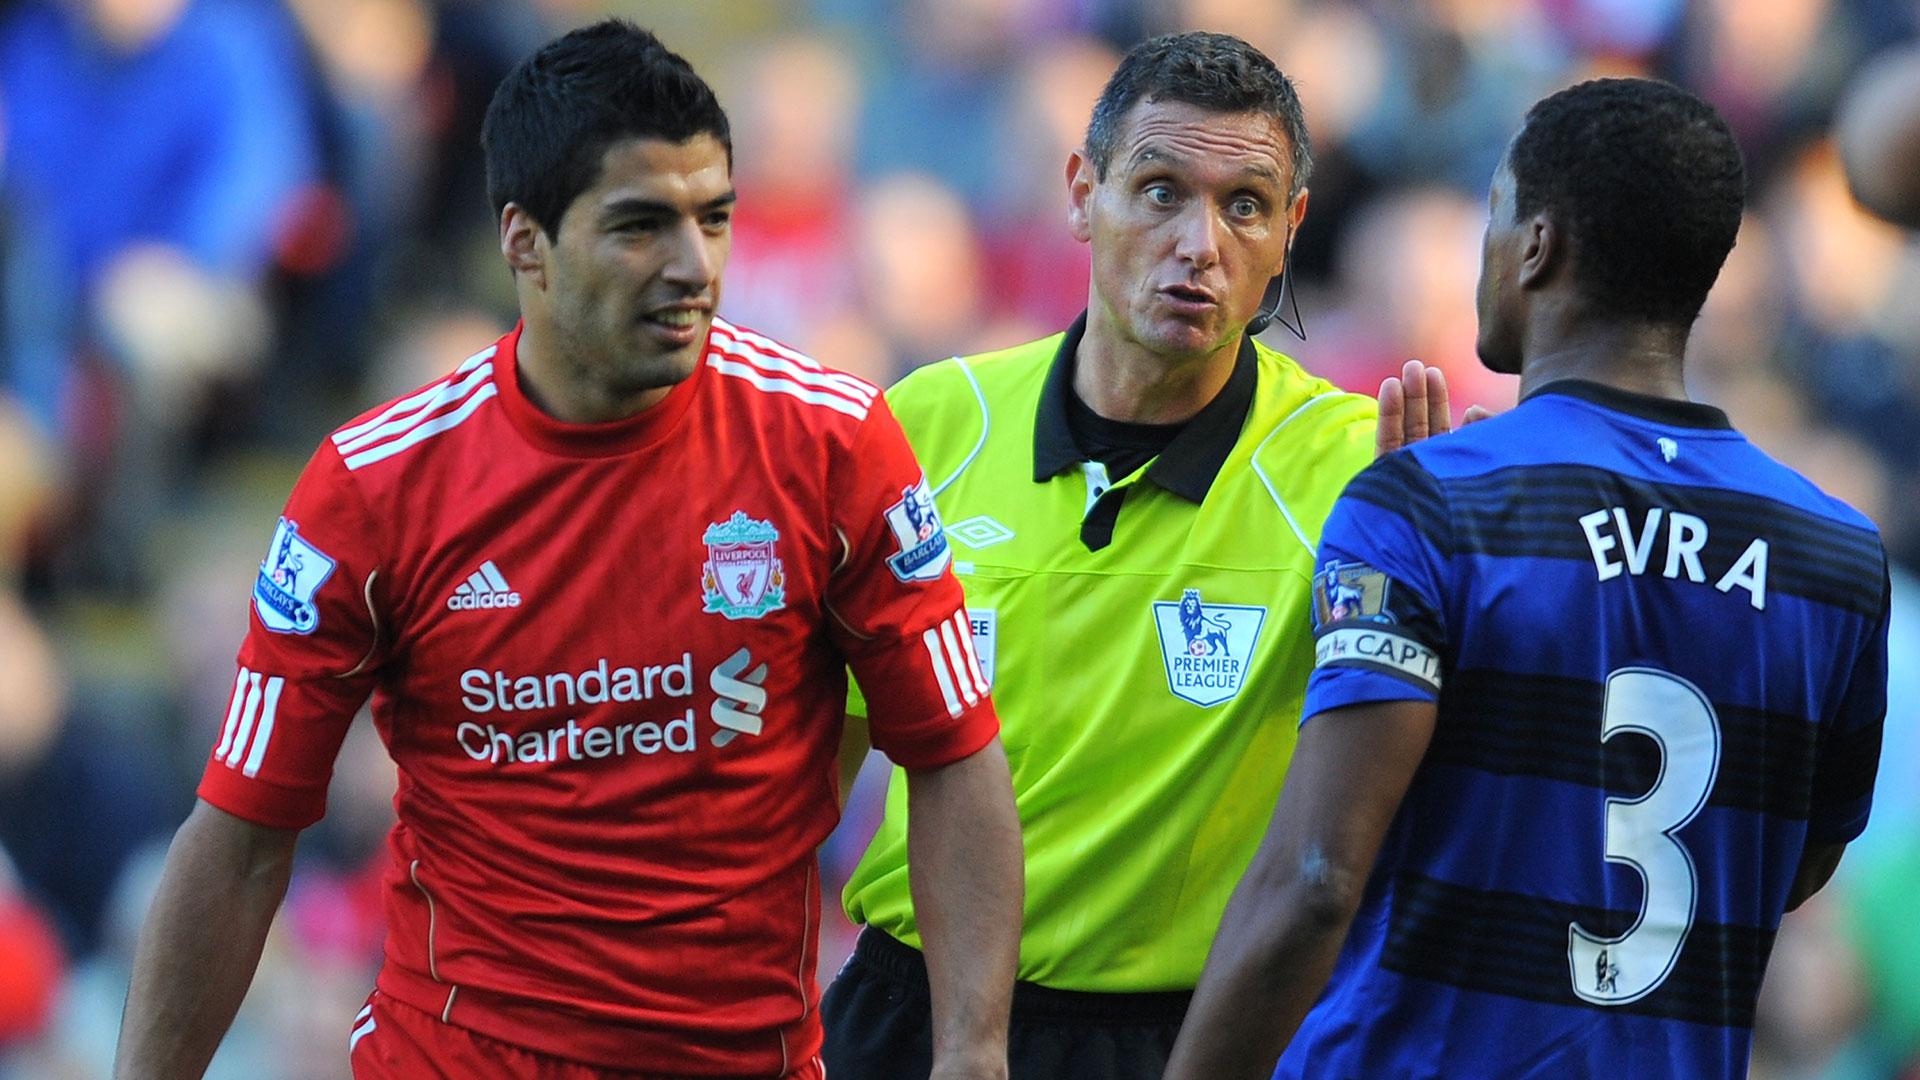 Luis Suarez Patrice Evra Liverpool Manchester United